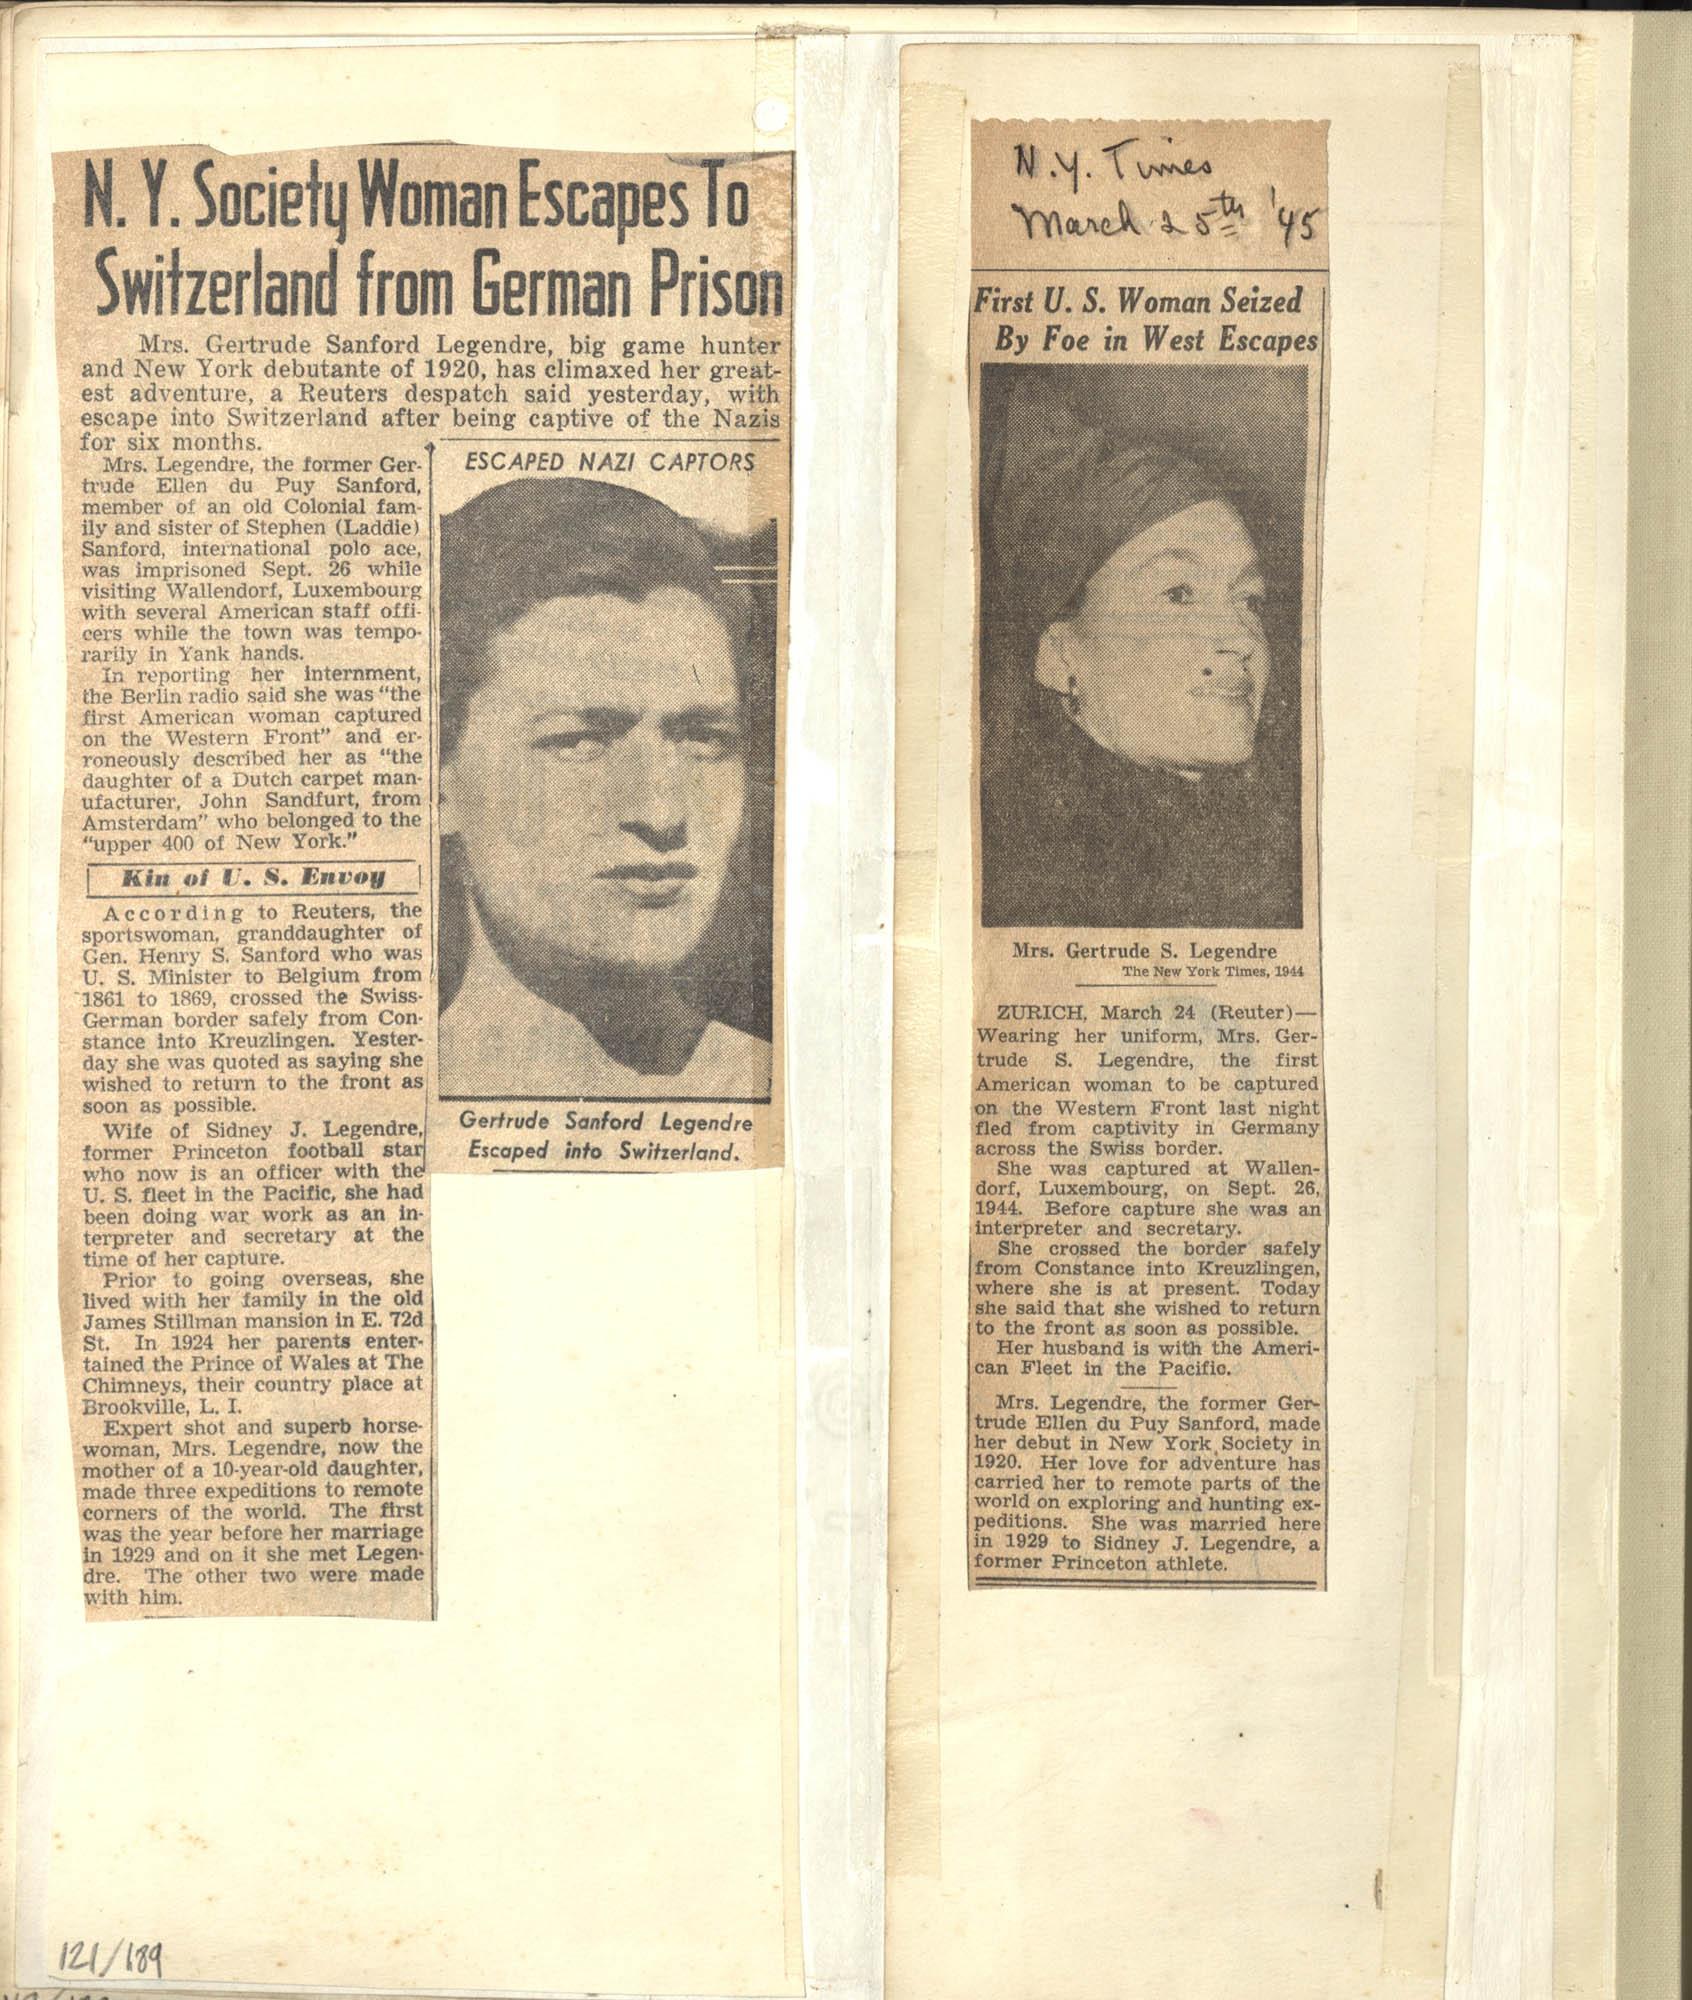 Gertrude Legendre OSS Scrapbook, 1944, Page 121